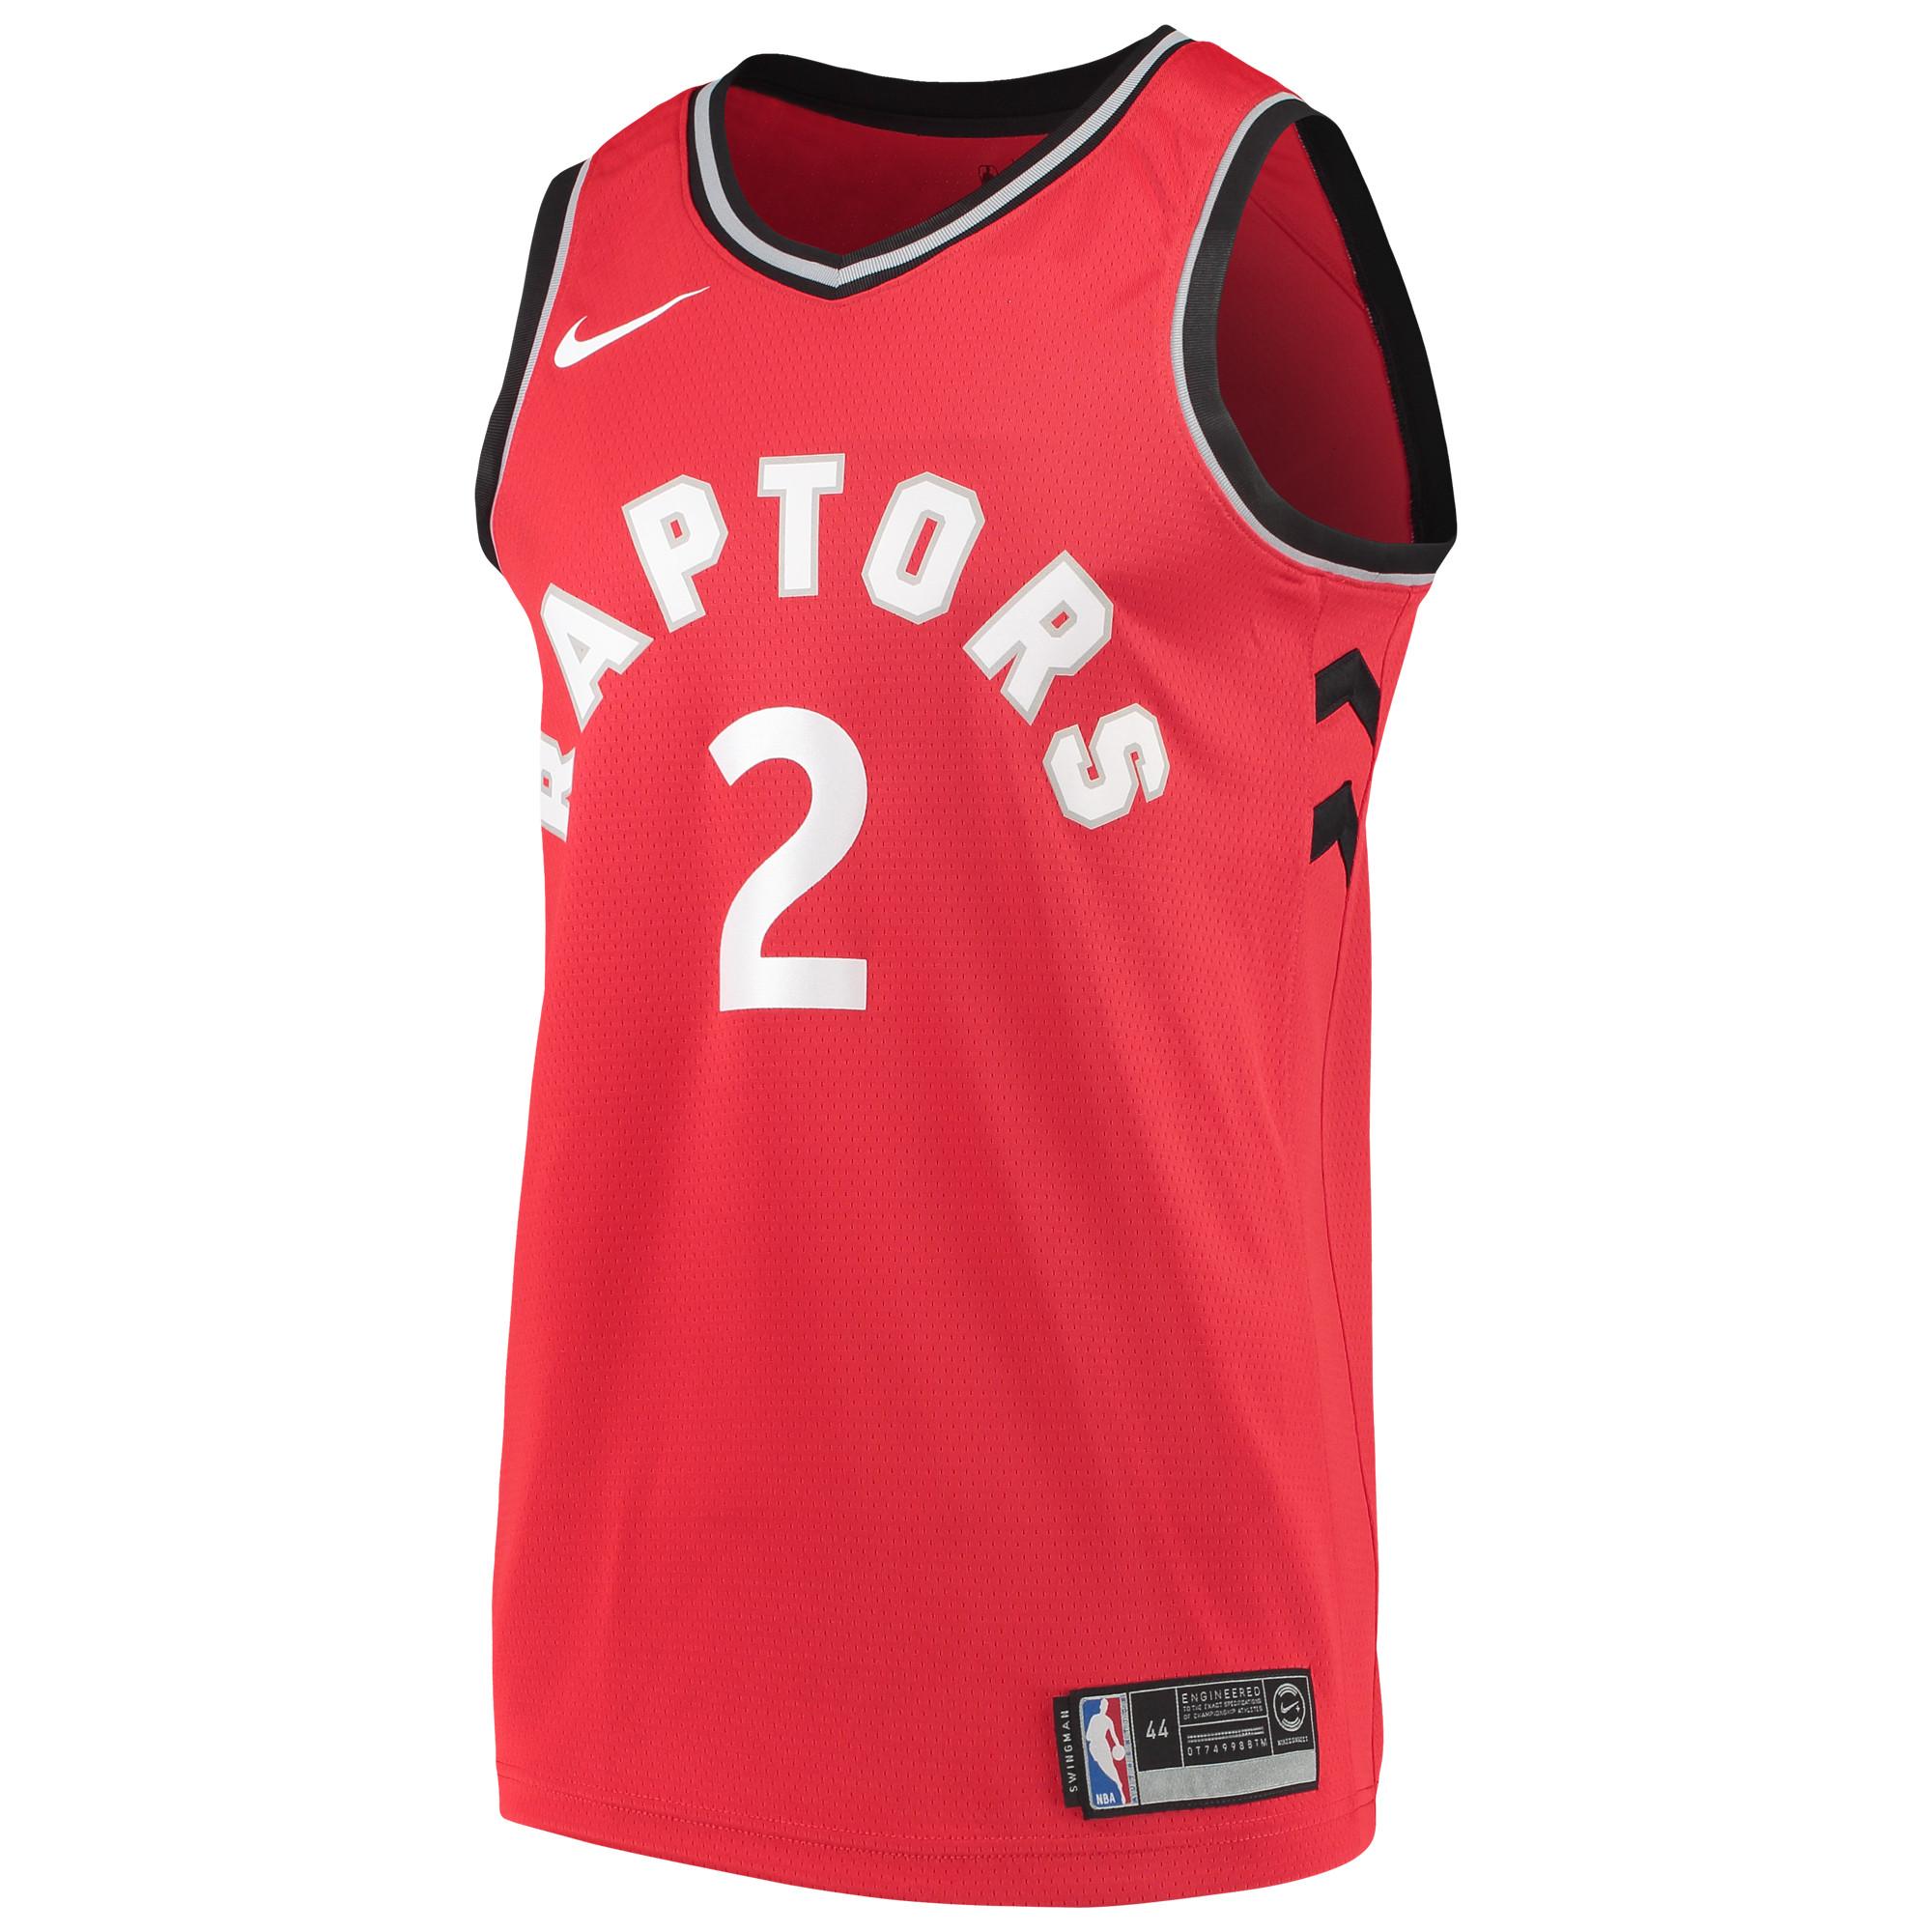 f92e353b87f1 NBA Fan Shop - Walmart.com